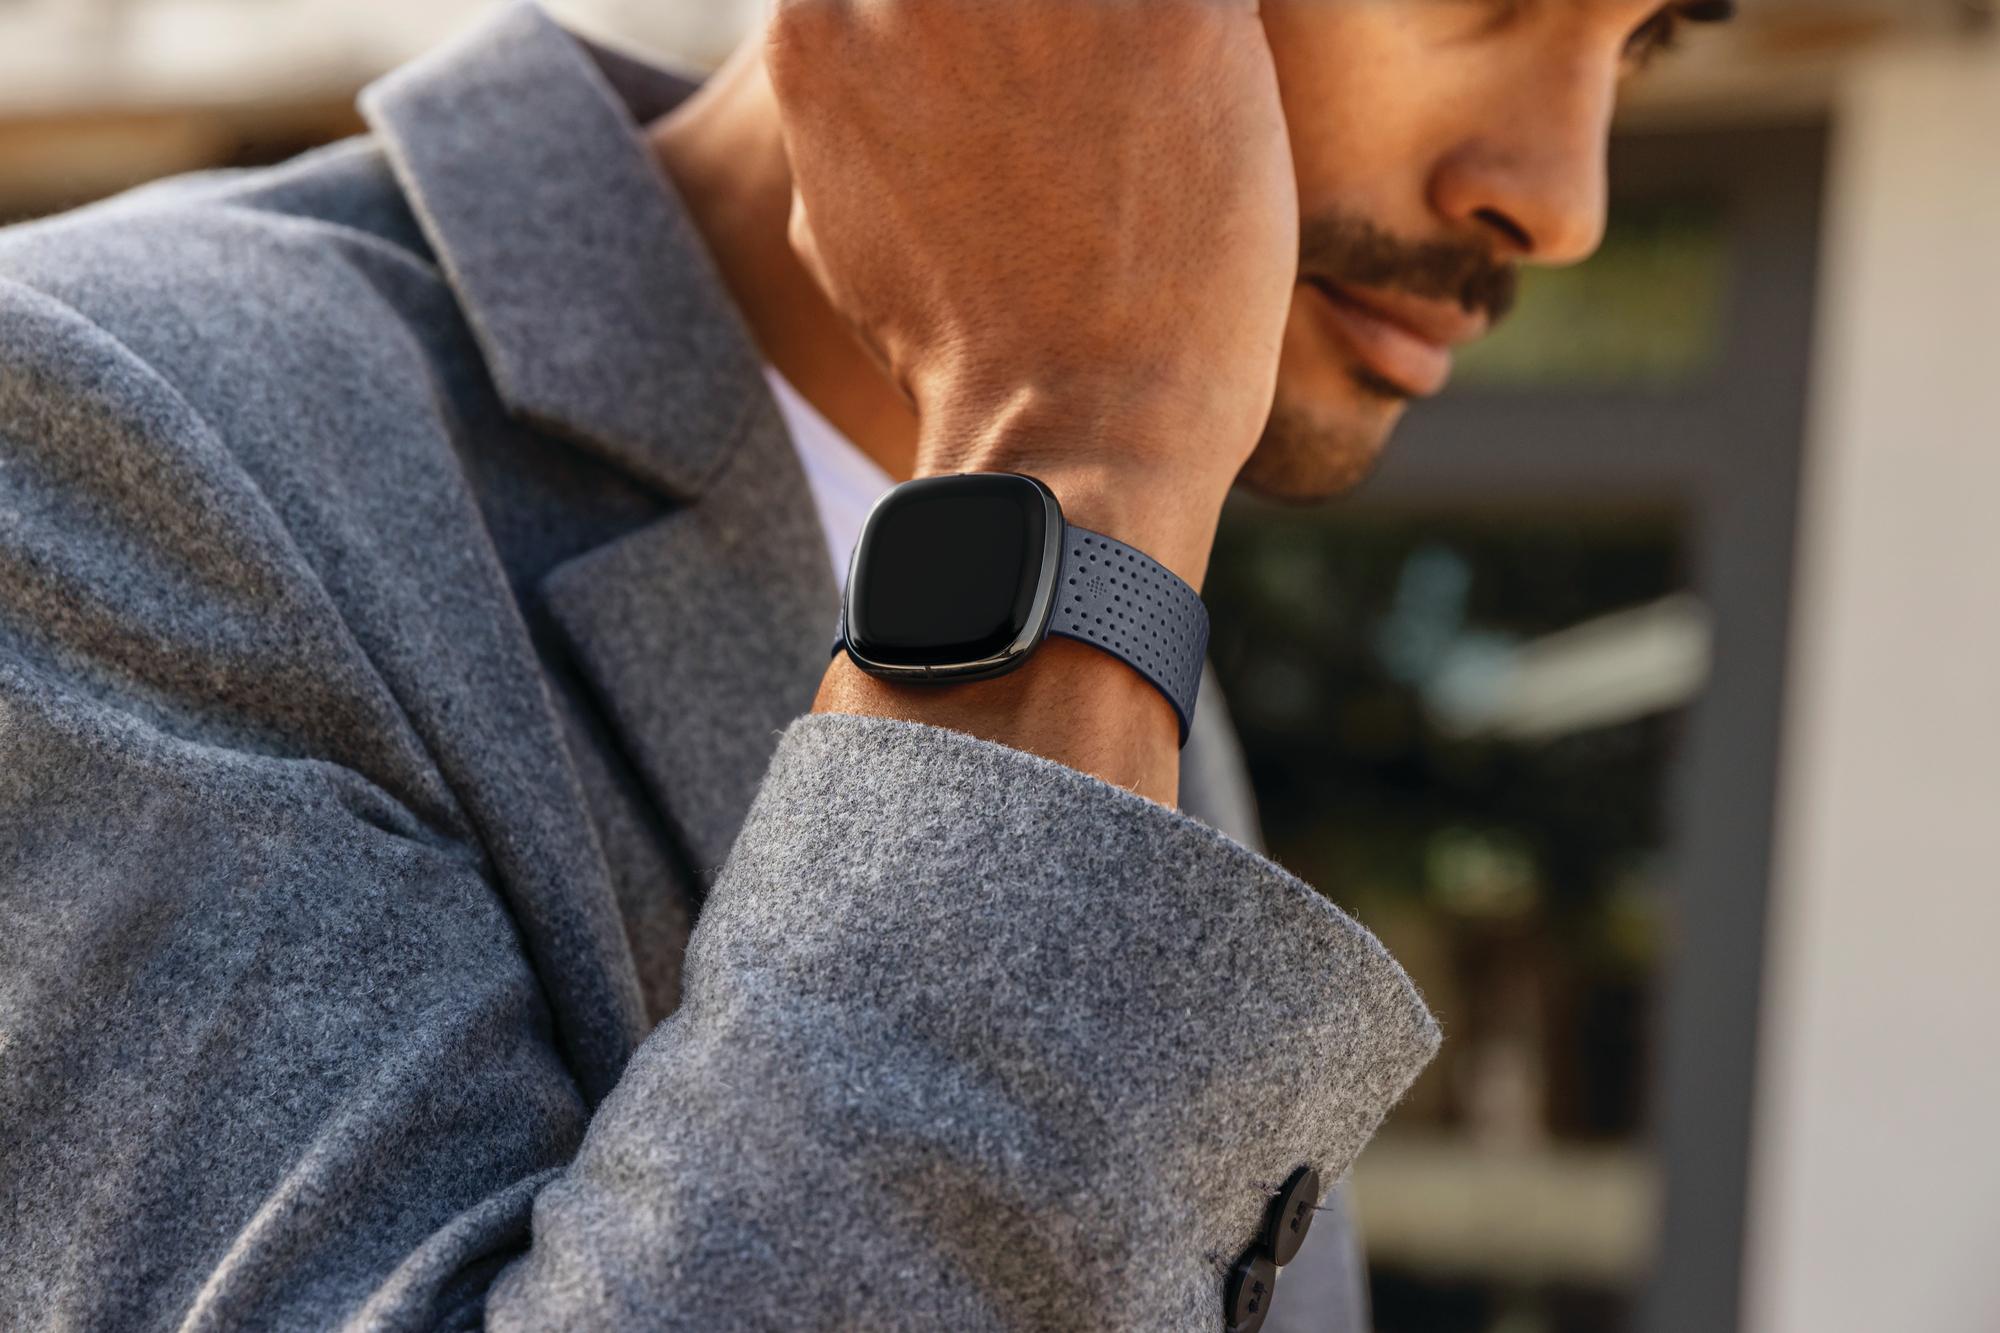 Montre GPS Fitbit Sense - Test & Avis - Mon GPS Avis.fr